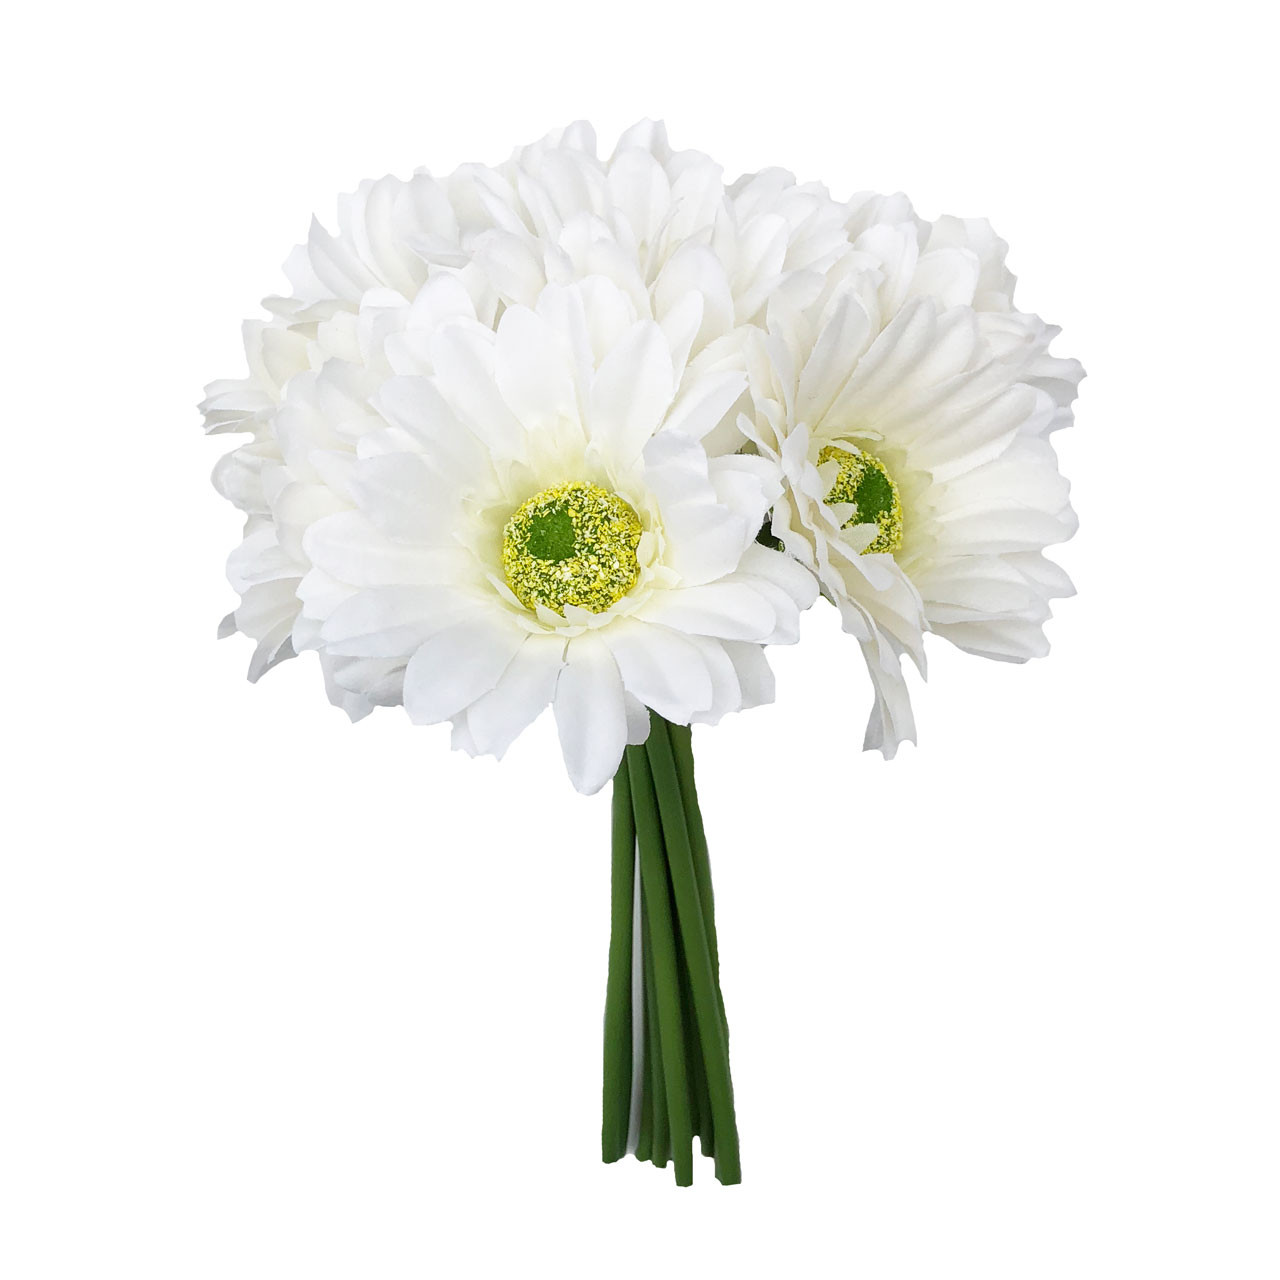 Ivory Daisy Bouquet Small Silk Wedding Flower 9 Stem